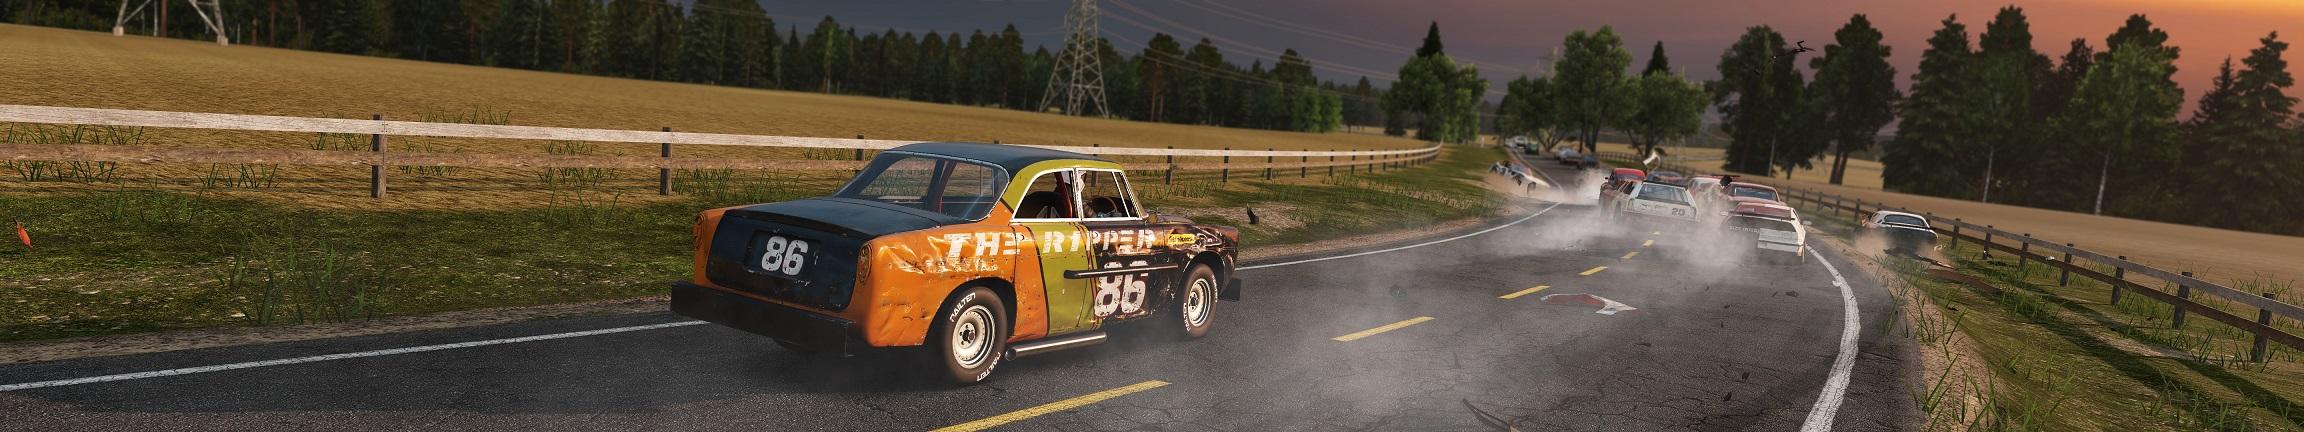 4 WRECKFEST The Very Track Pack FARMALNDS copy.jpg